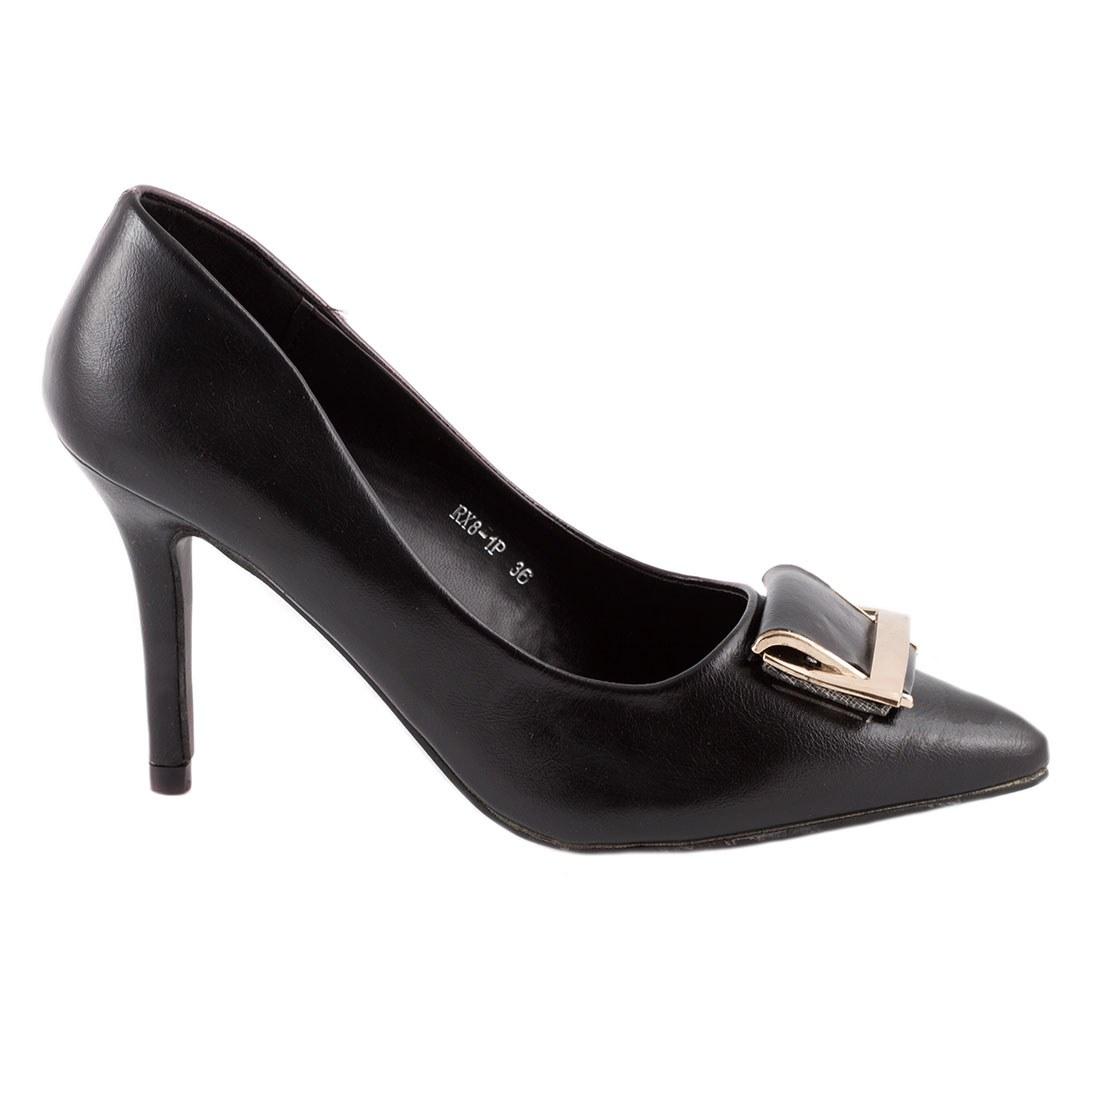 Pantofi de dama cu accesoriu auriu RX8-1P-NEGRU